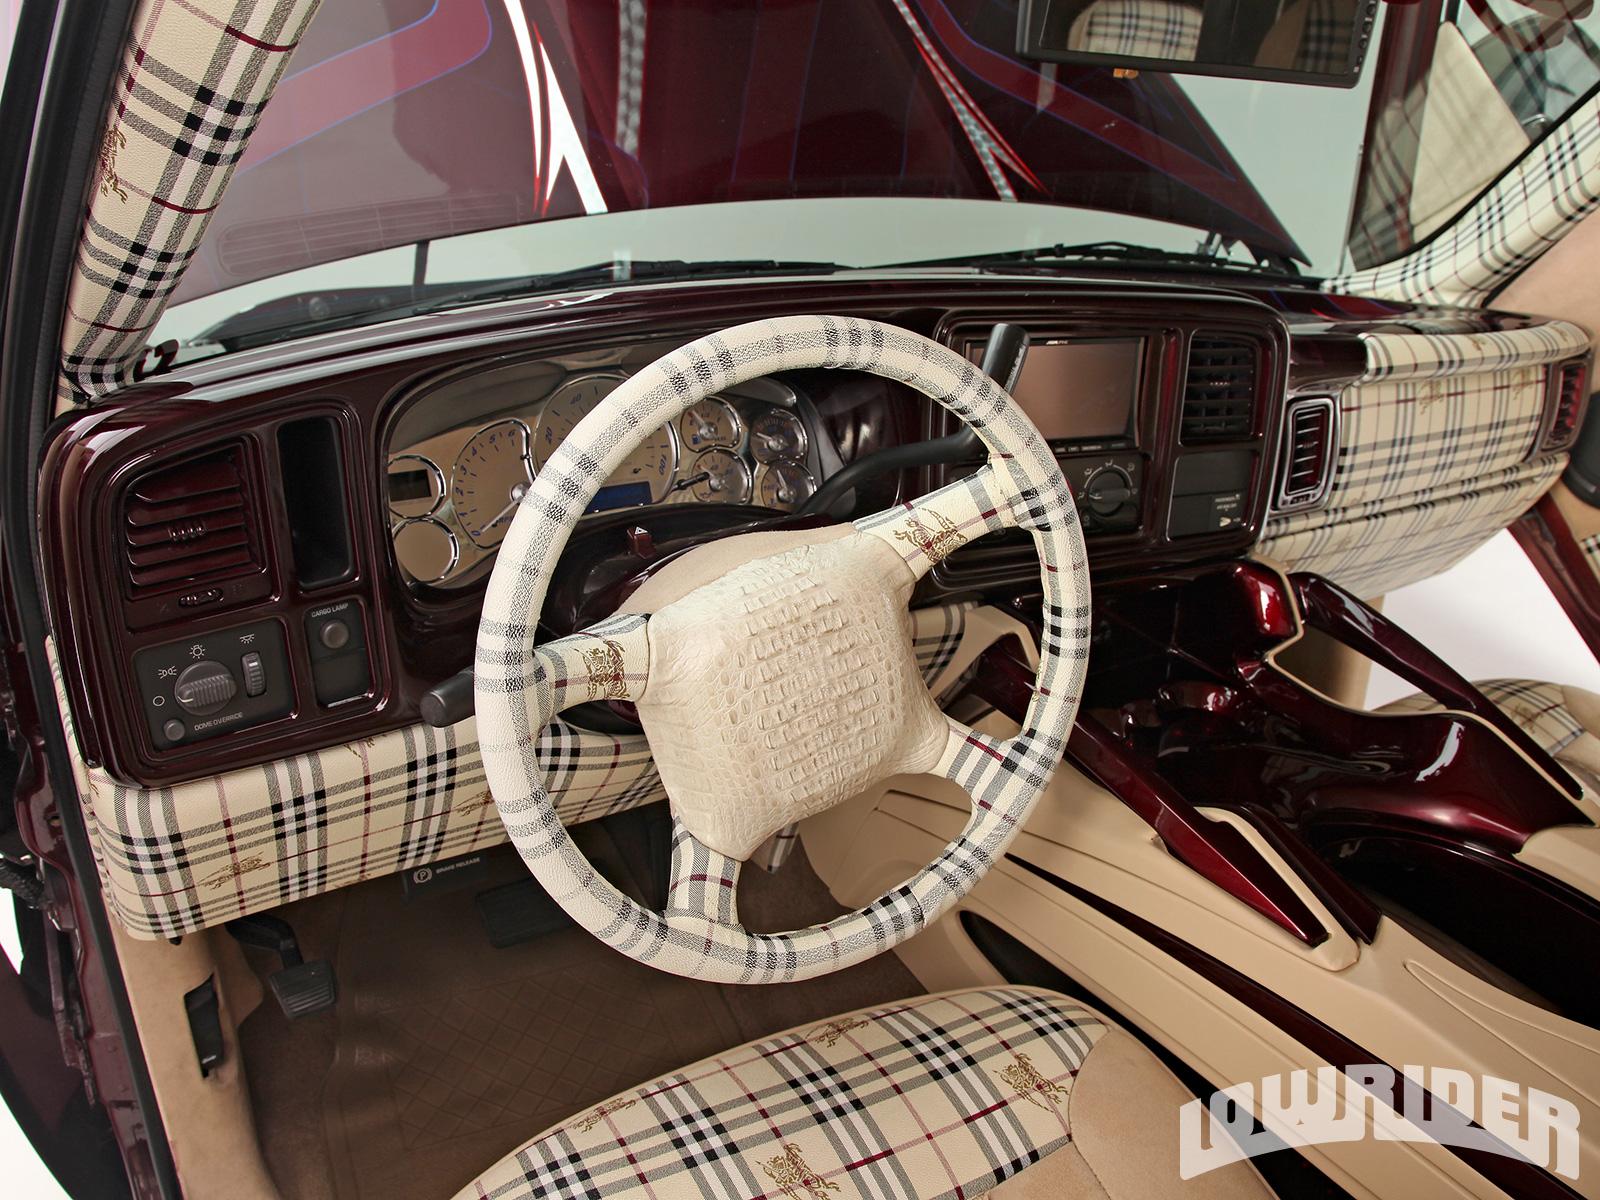 2000 Chevrolet Silverado Lowrider Magazine